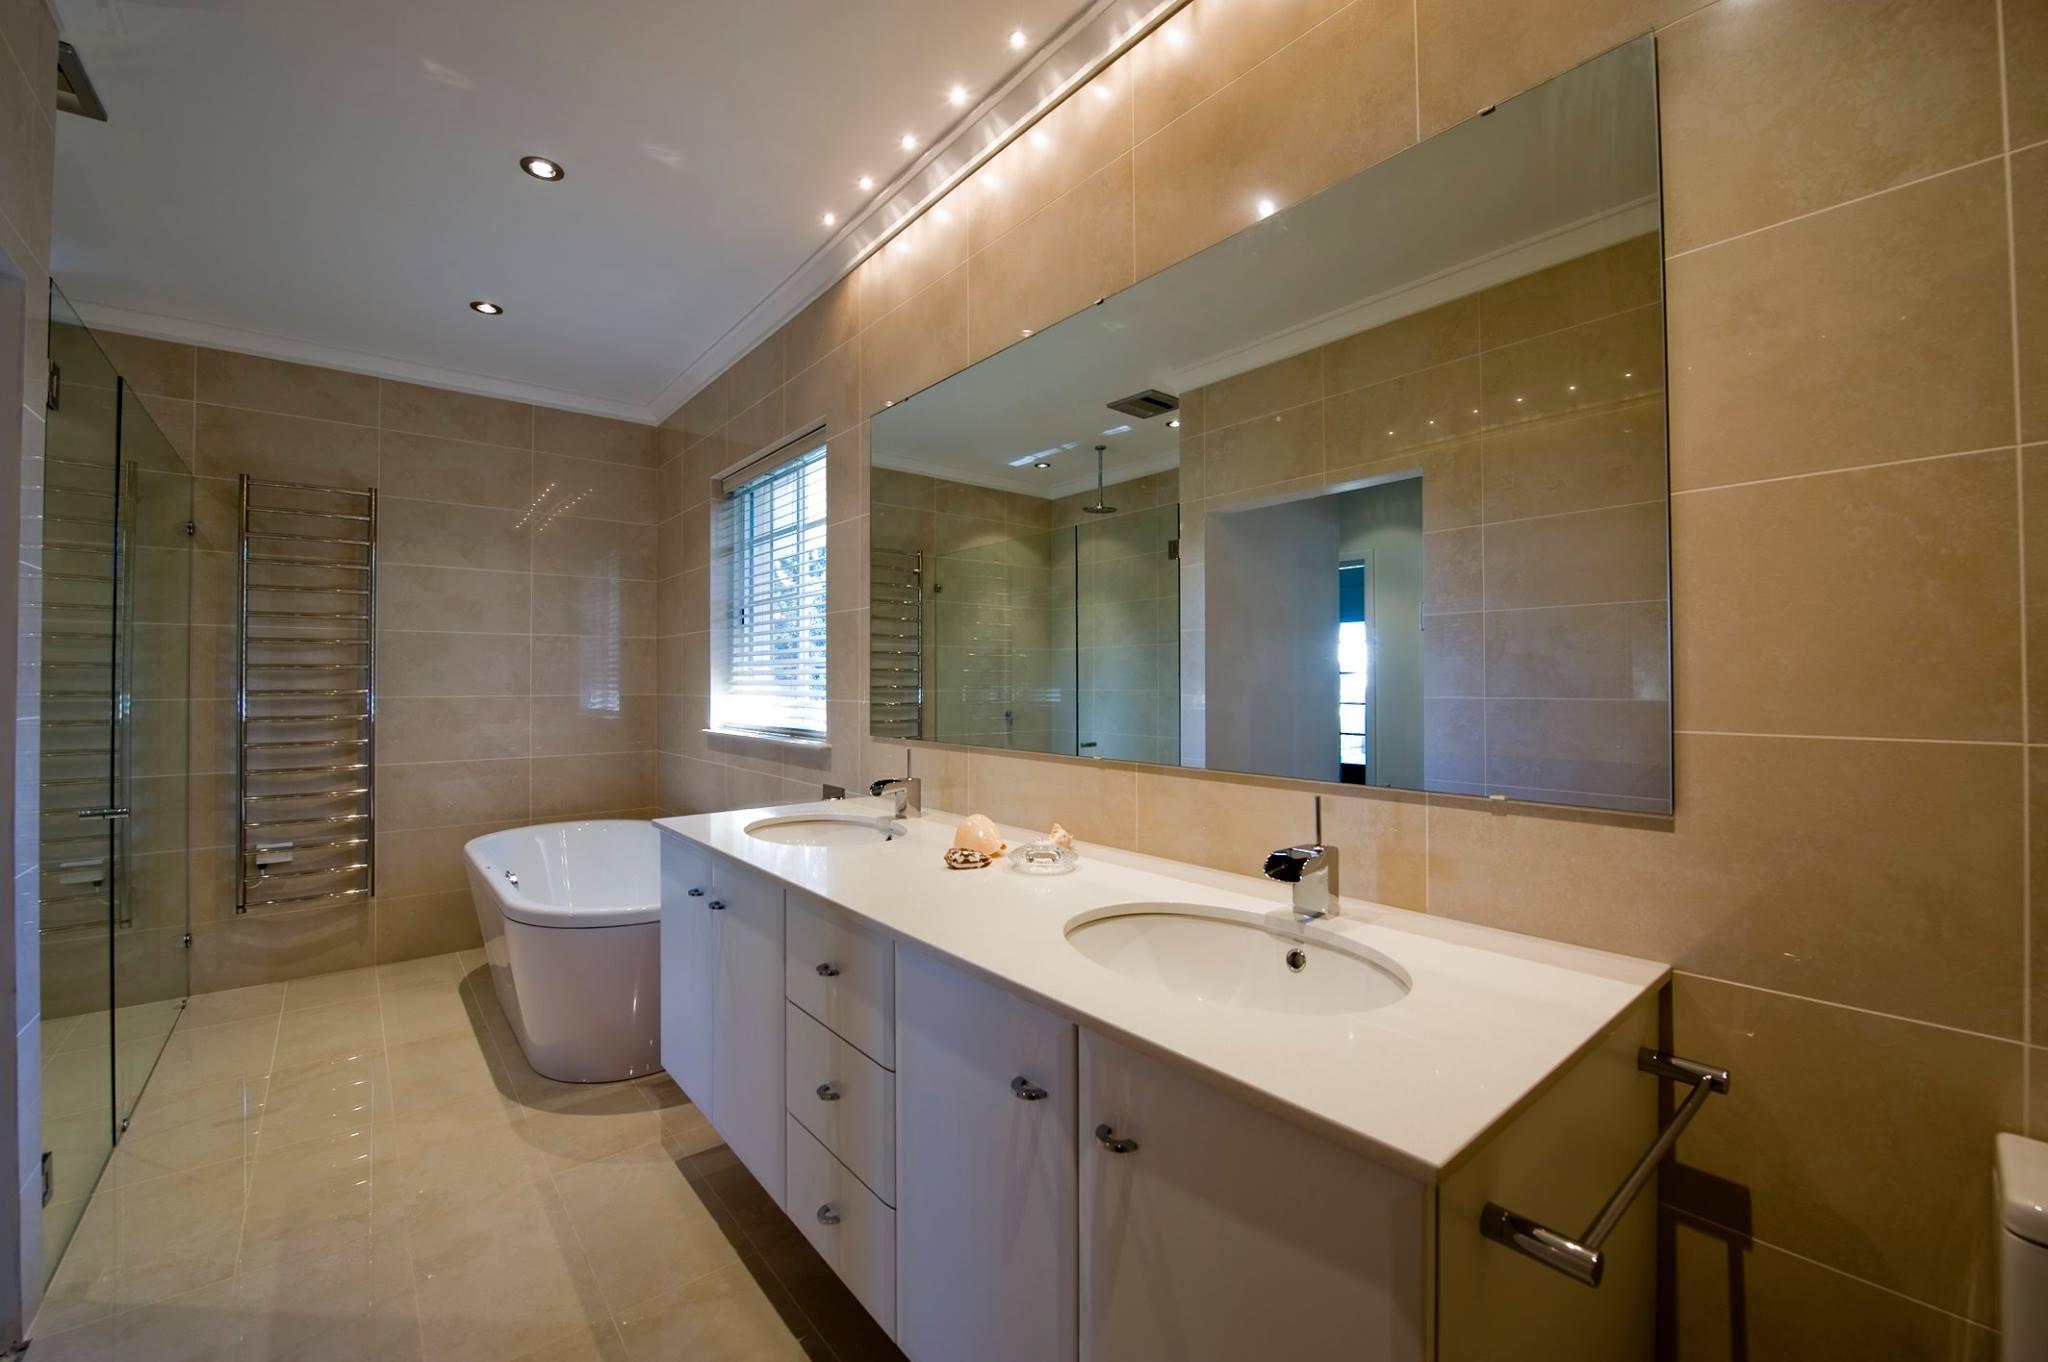 Bathroom renovations campbelltown modern vintage for Bathroom renovations campbelltown